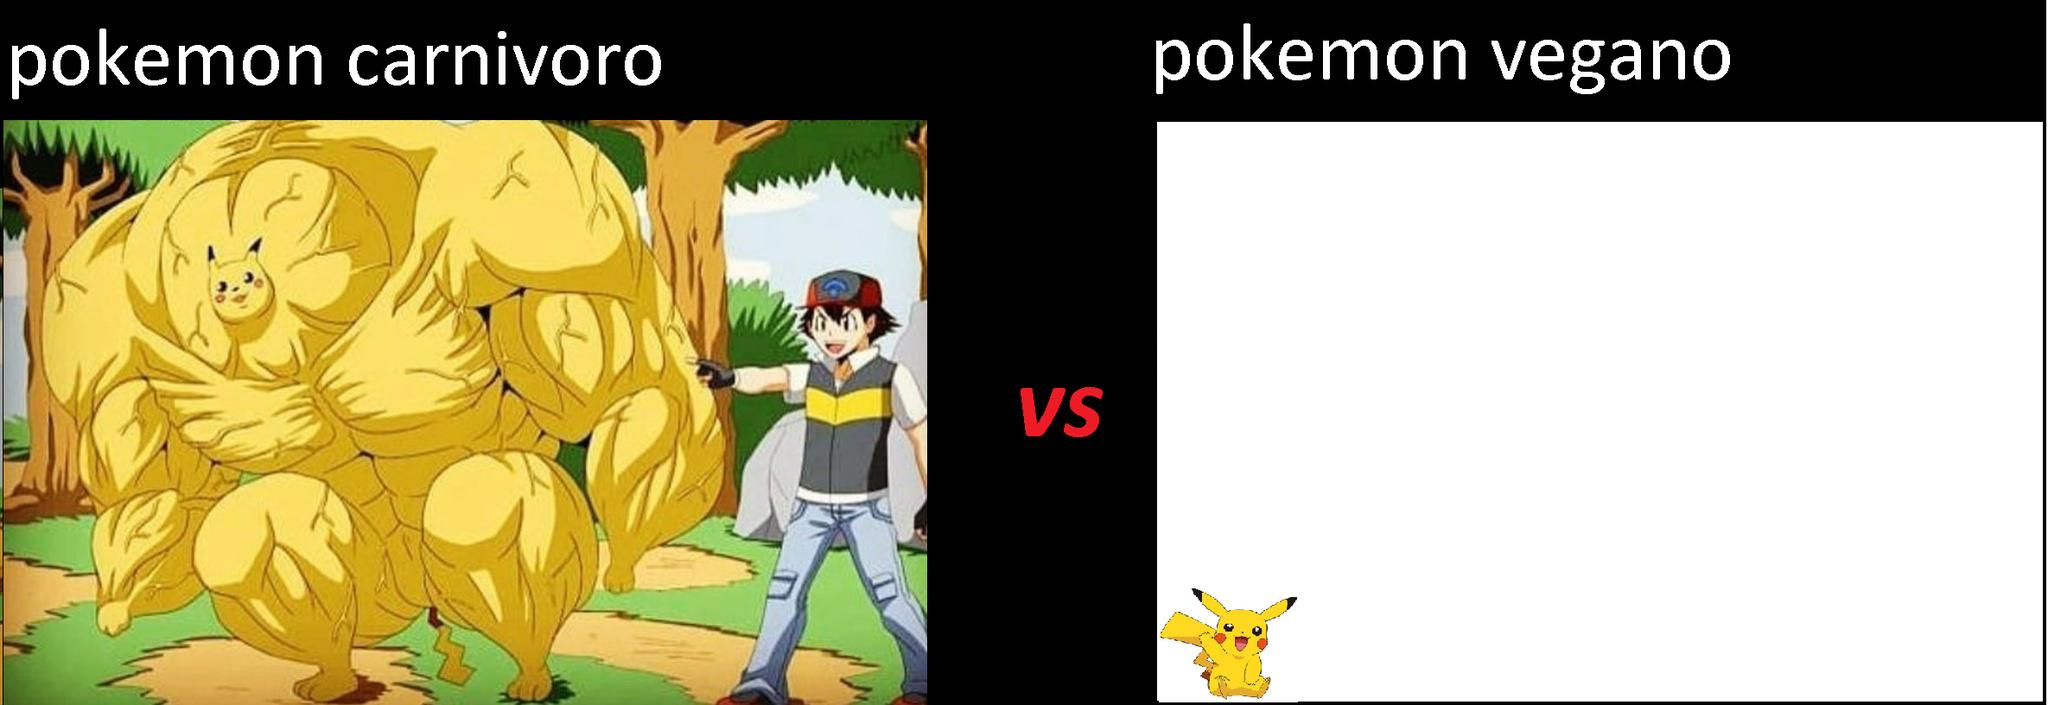 alimenten con carne a sus pokemon - meme